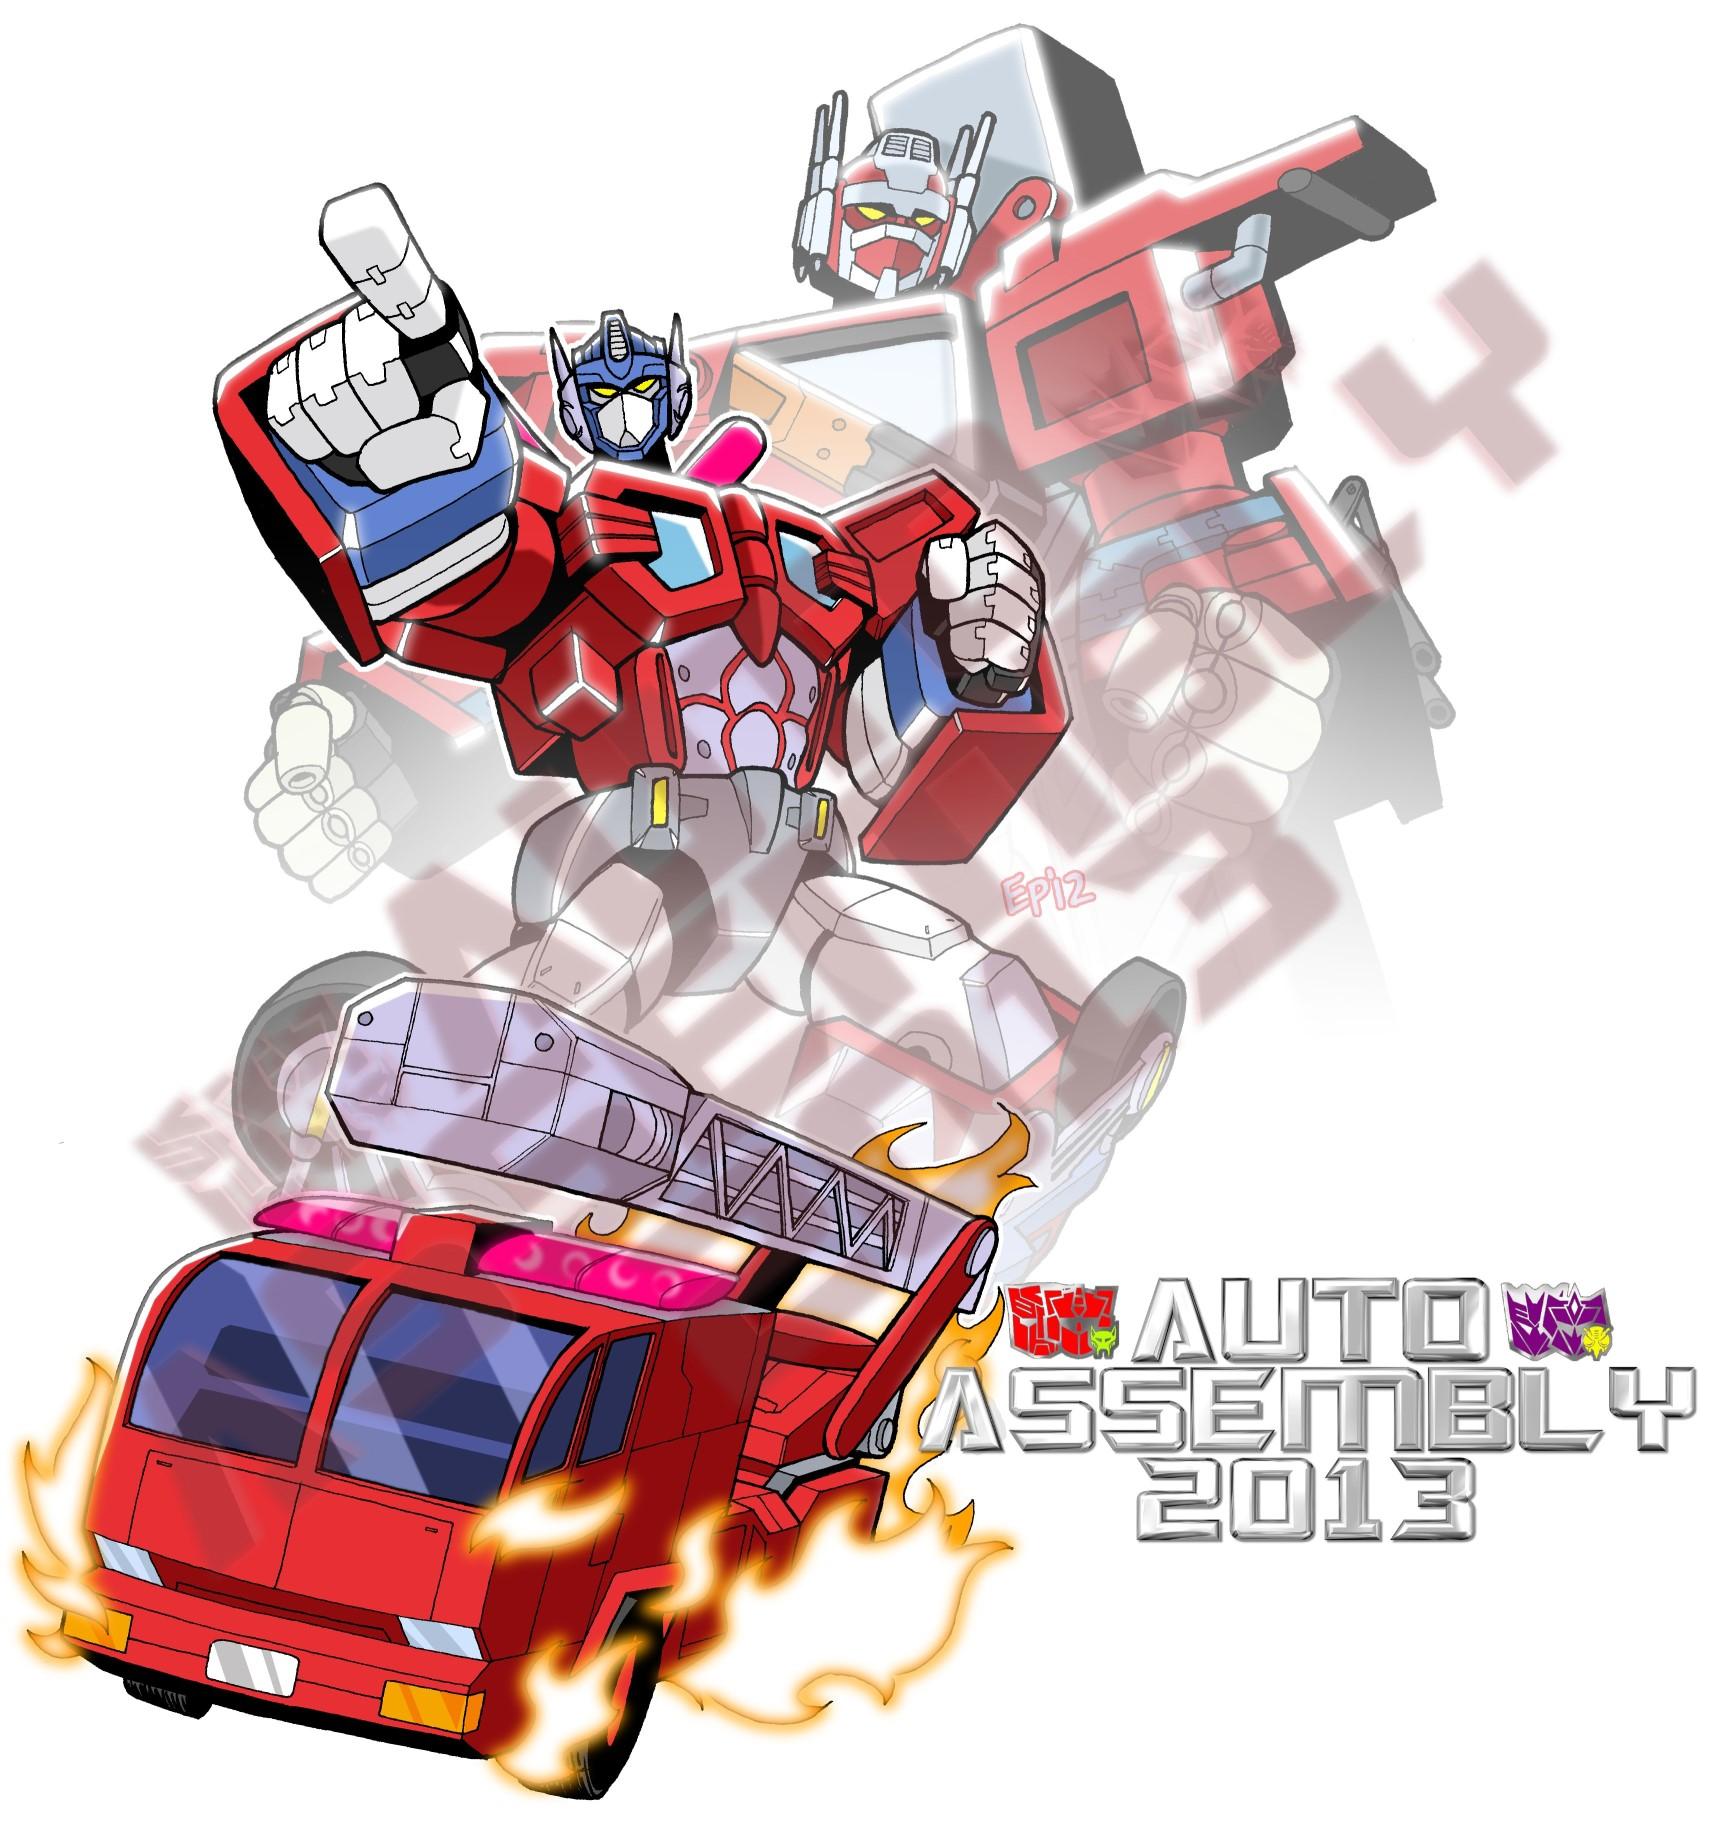 Auto Assembly 2013 Exclusive T-Shirt - Optimus Prime